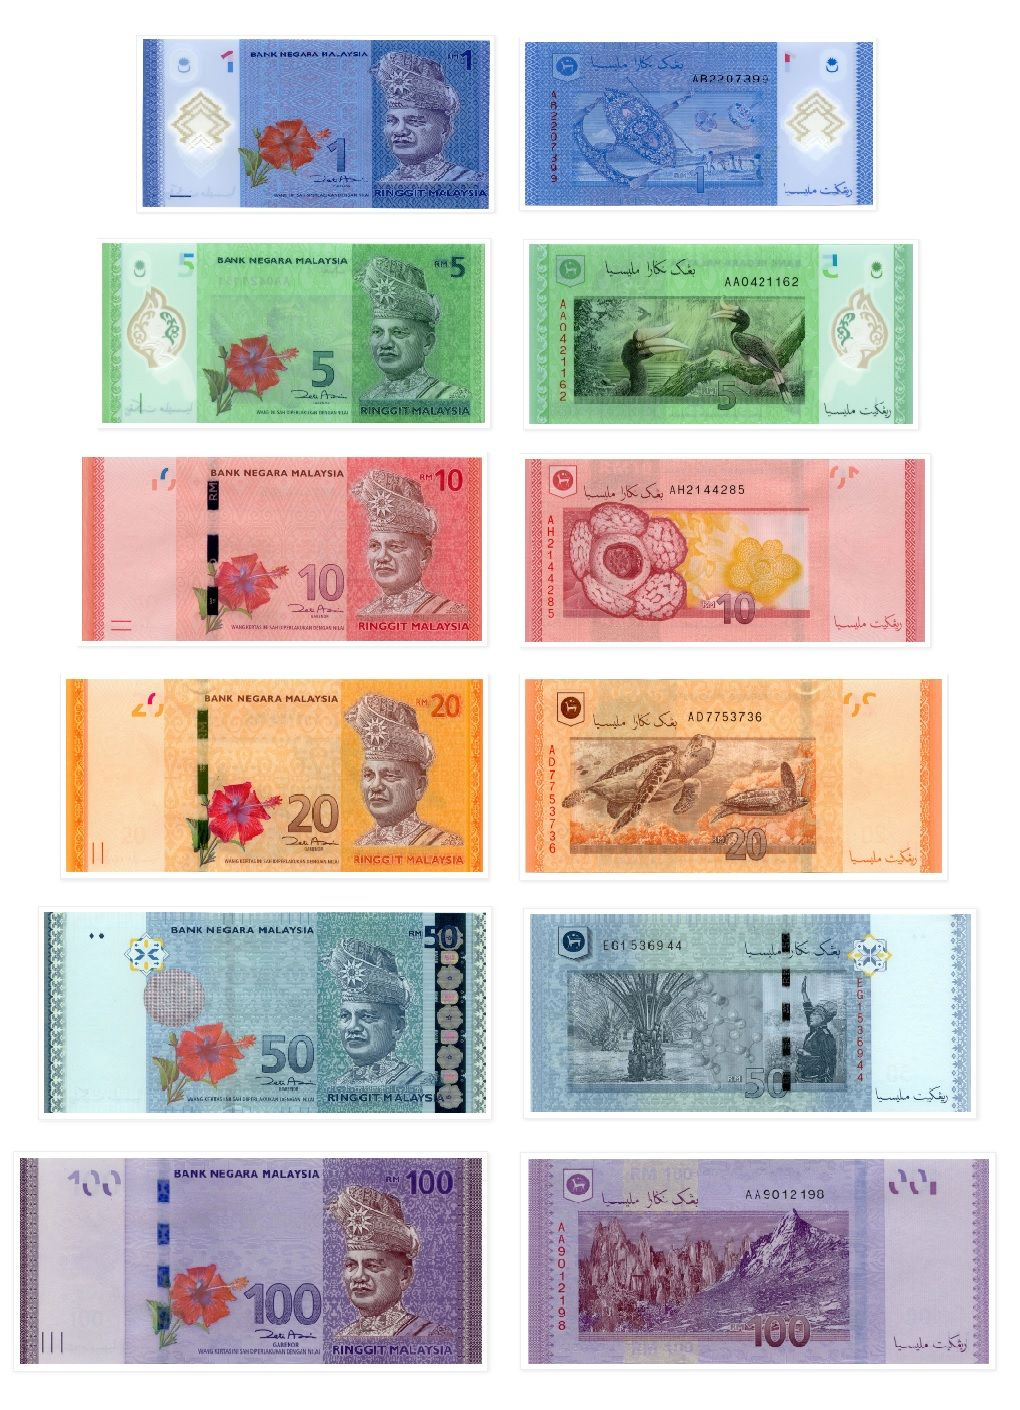 Malaysia   Money notes [ 1410 x 1020 Pixel ]